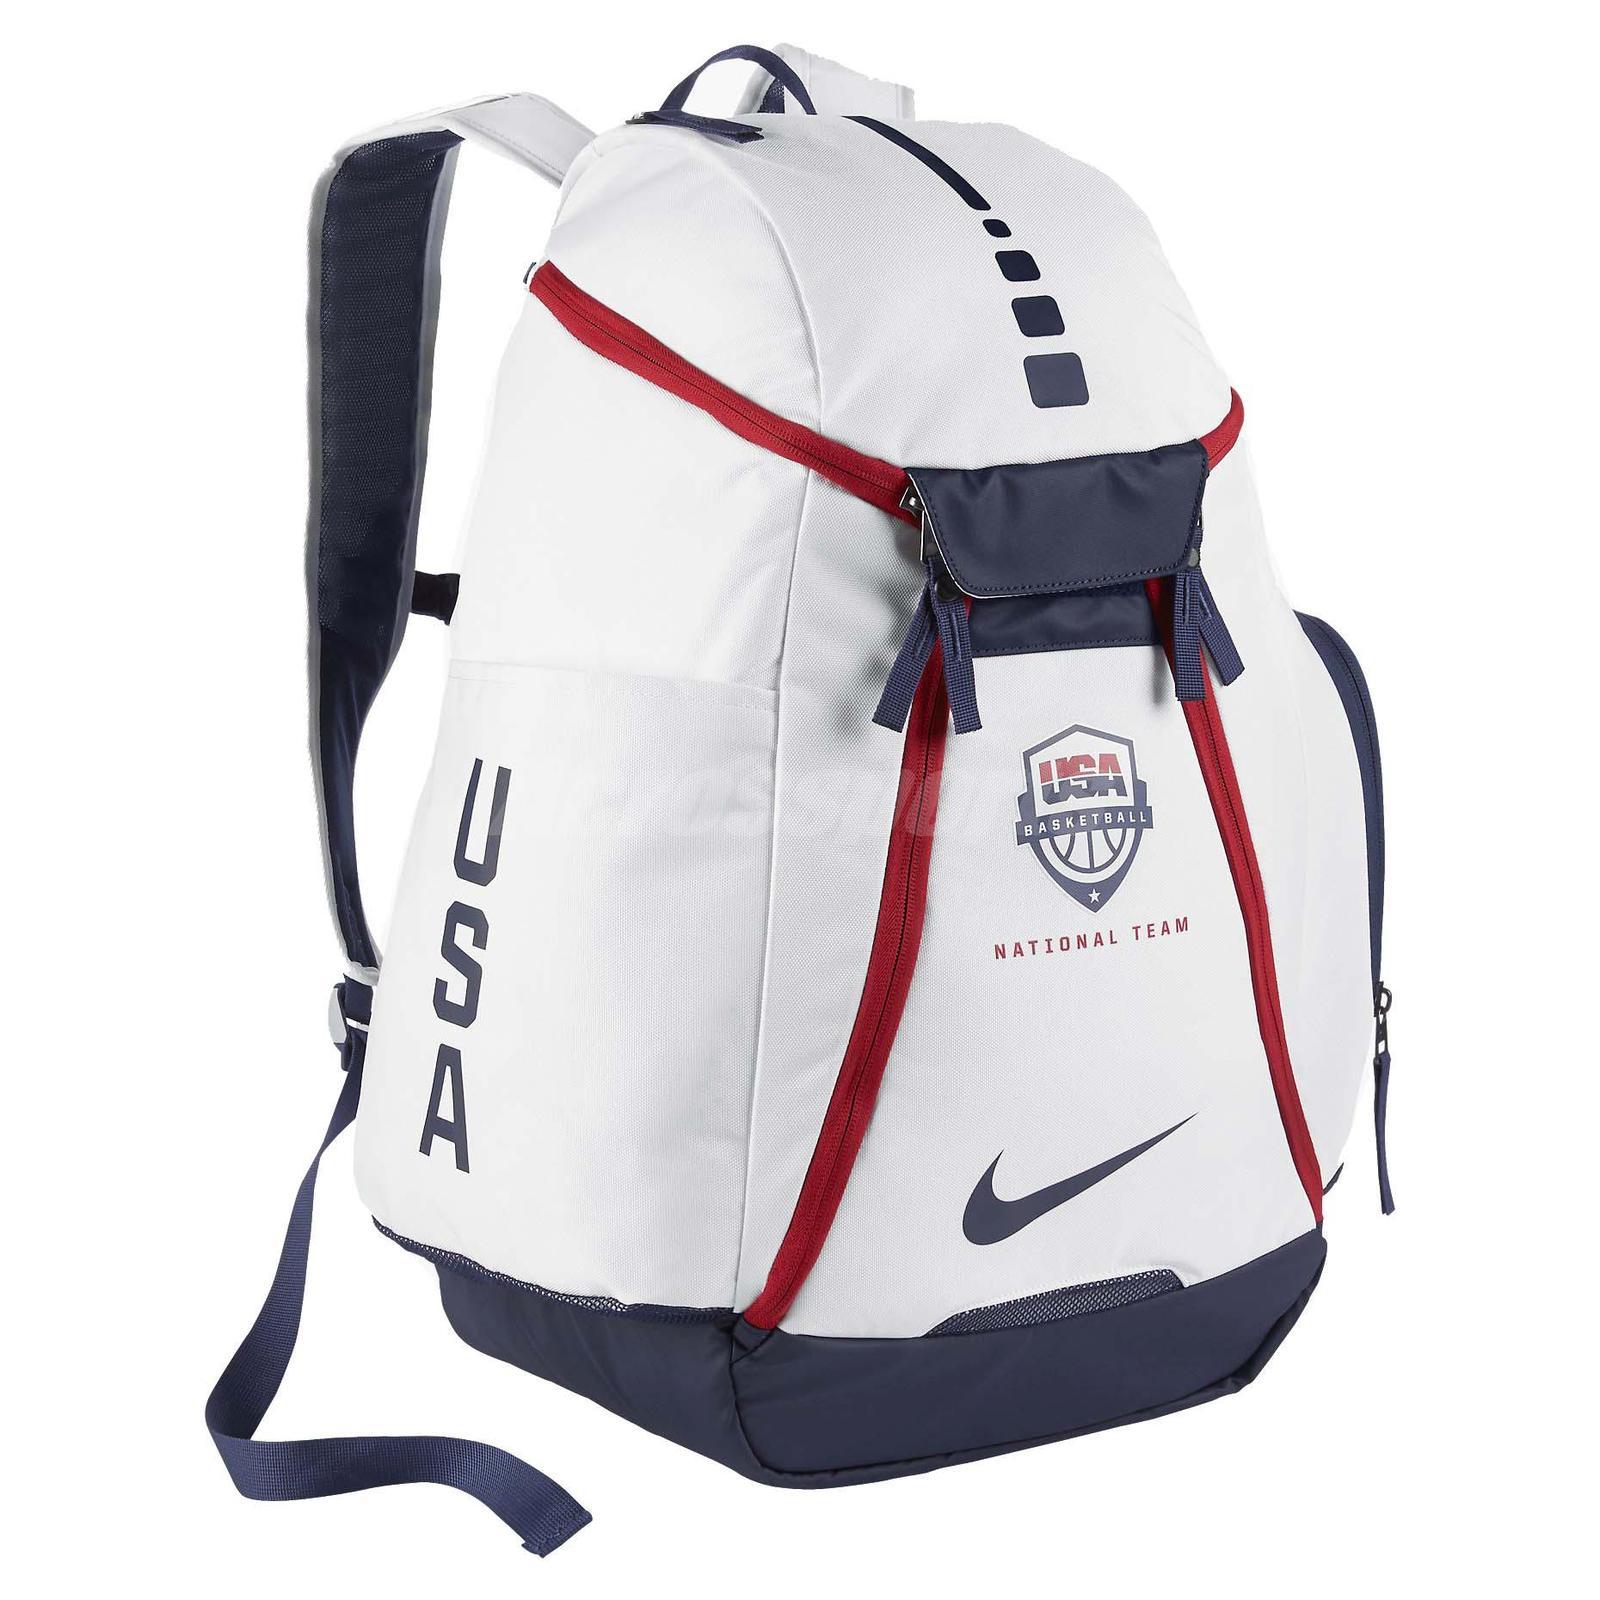 2018 Fashion backpack USA Dream team